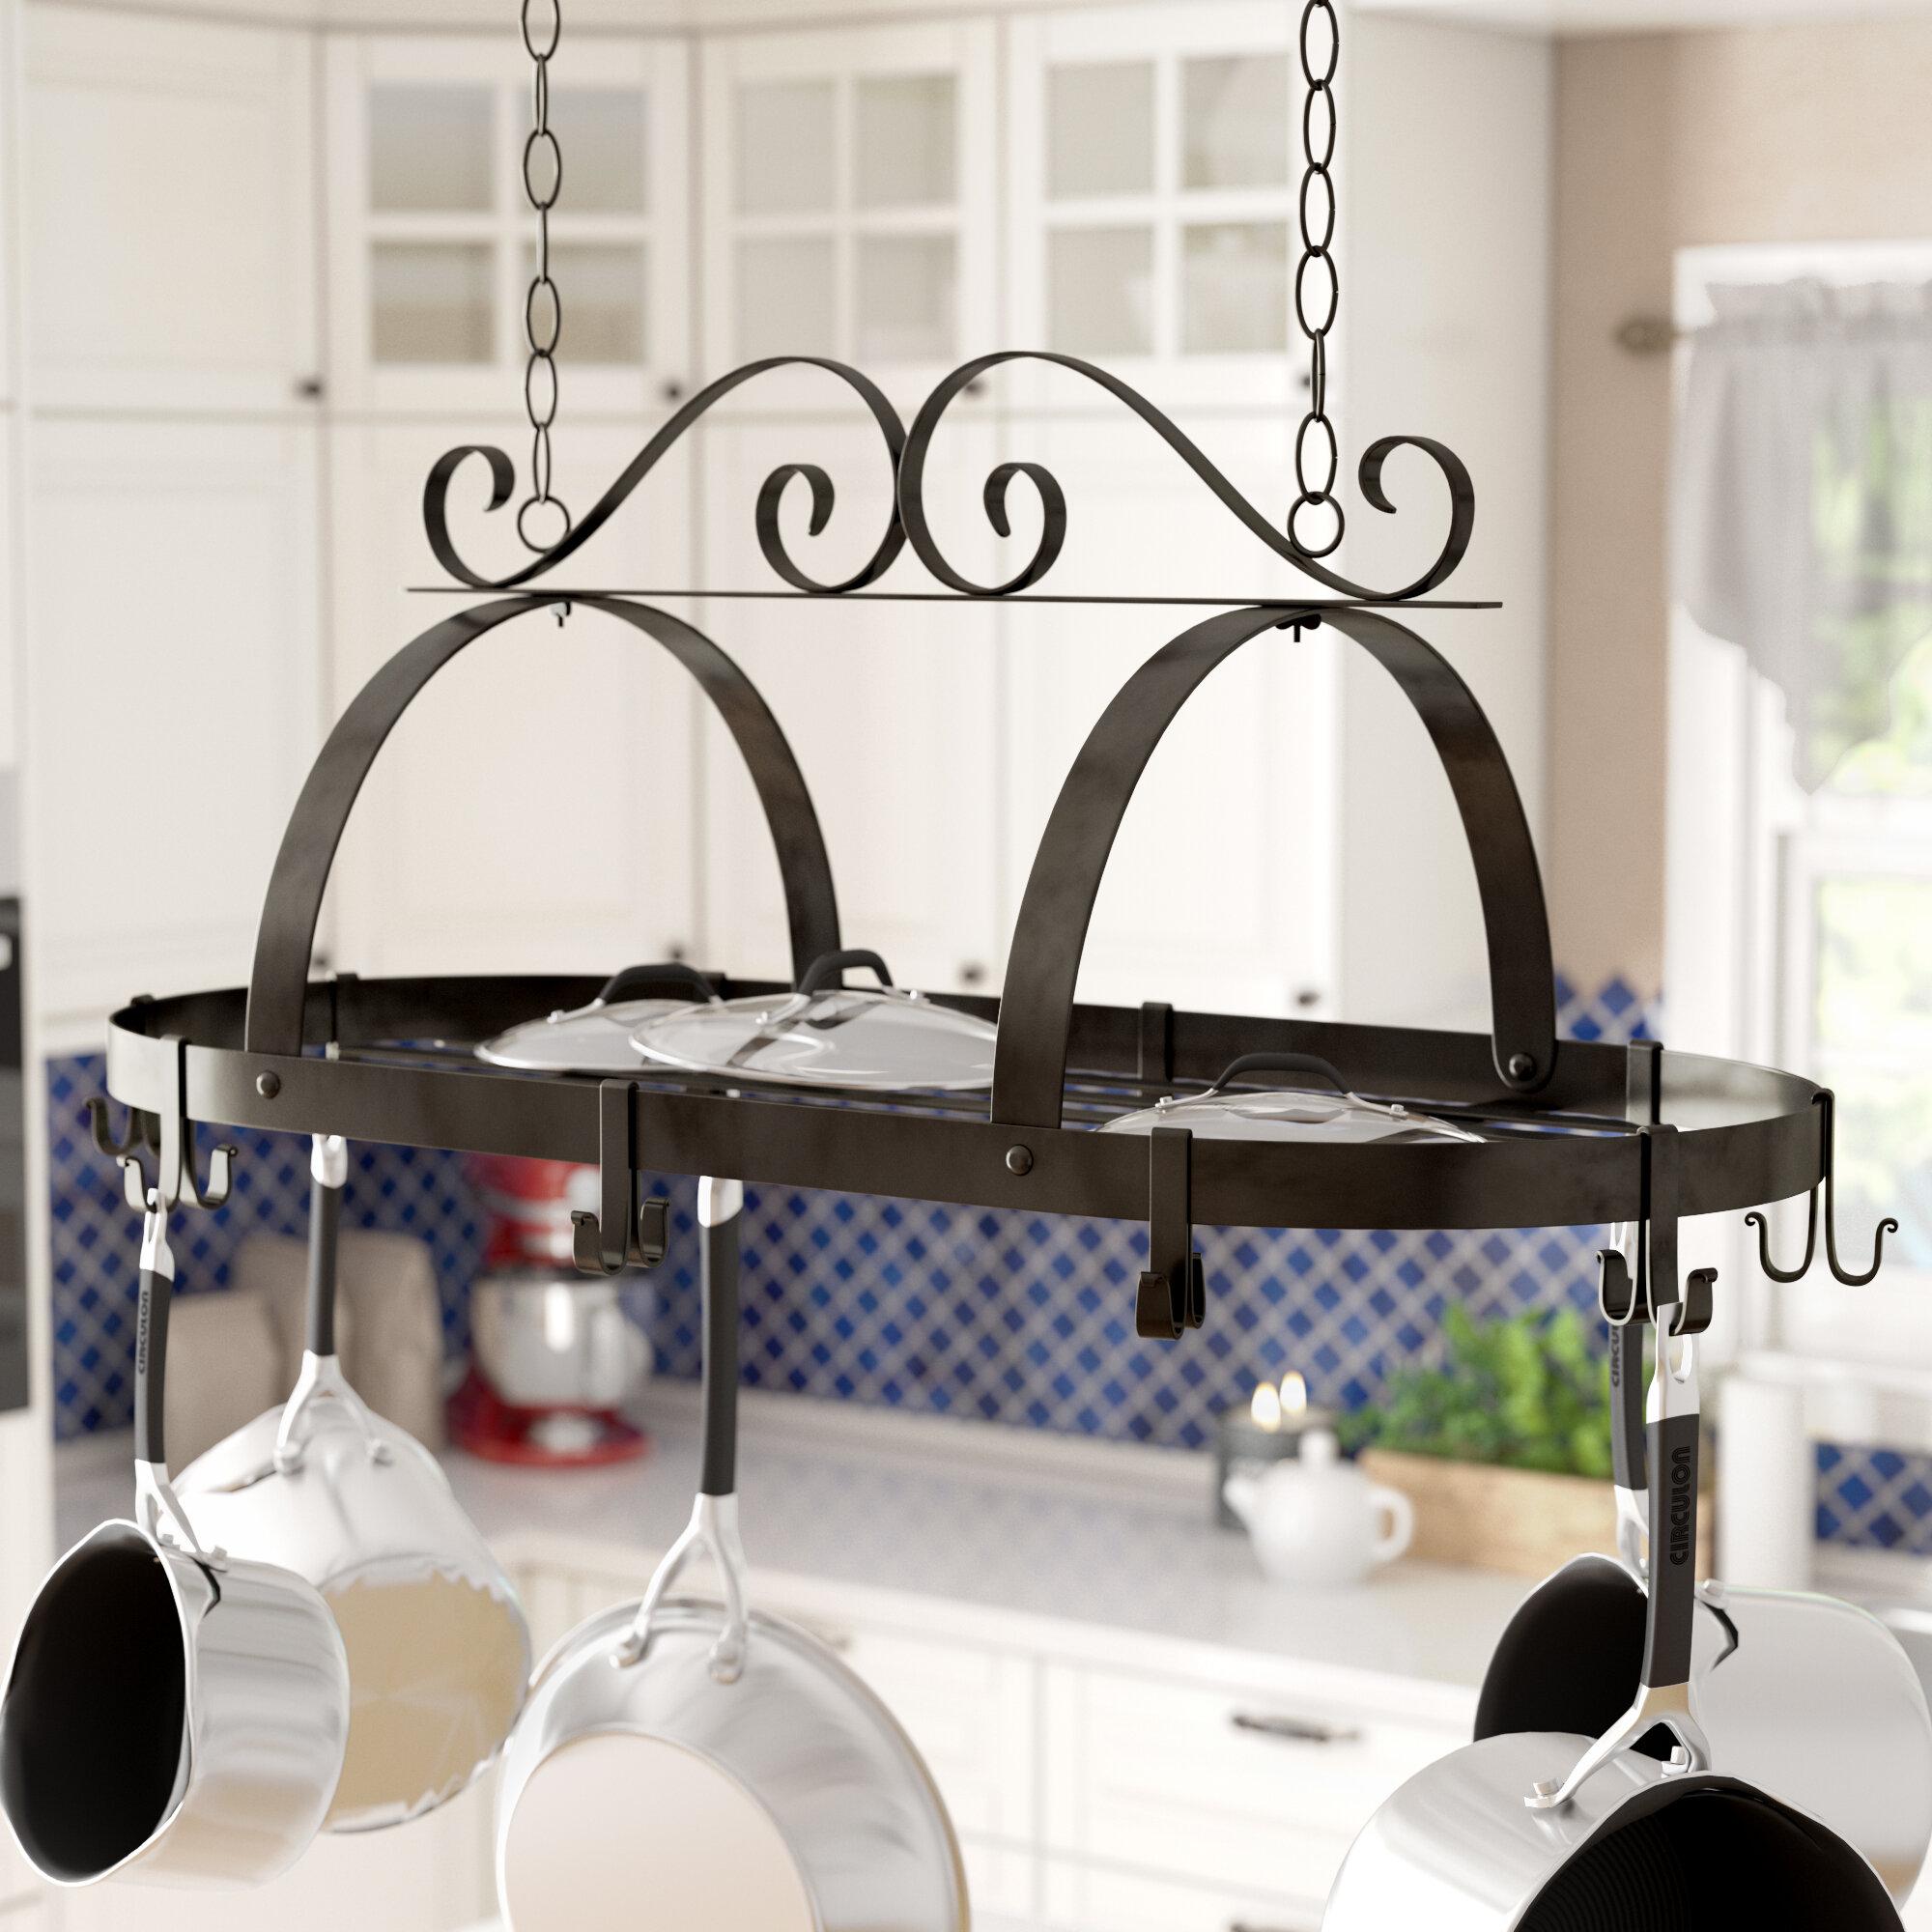 Darby home co kitchen hanging pot rack reviews wayfair